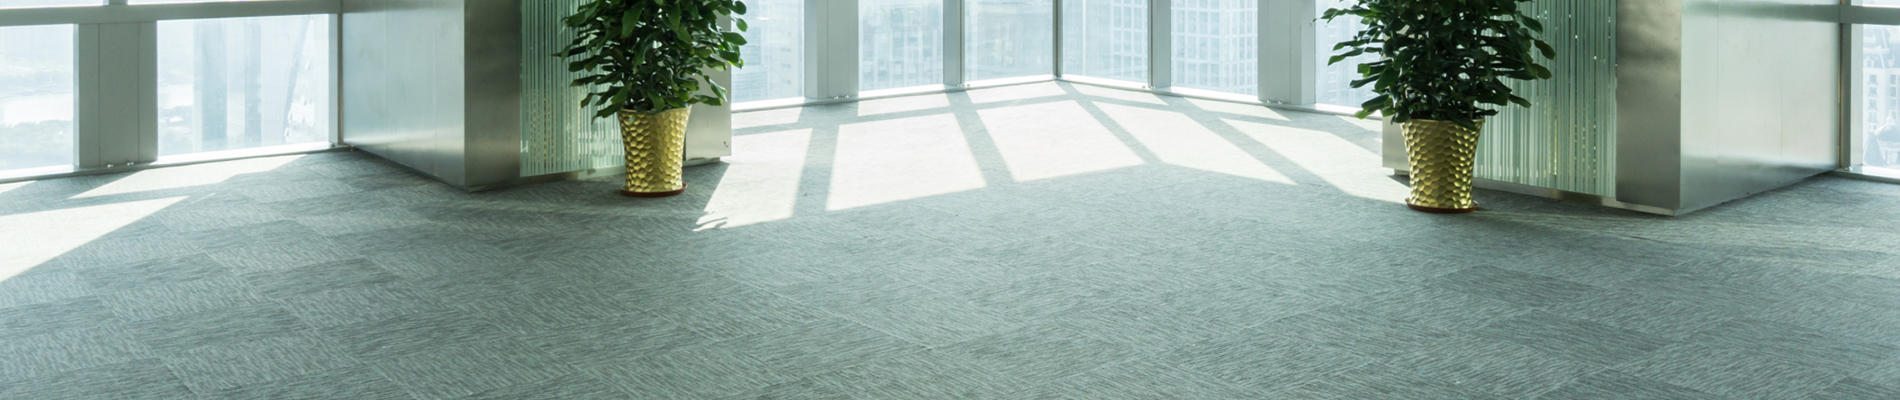 Canyon Carpet Care image 1